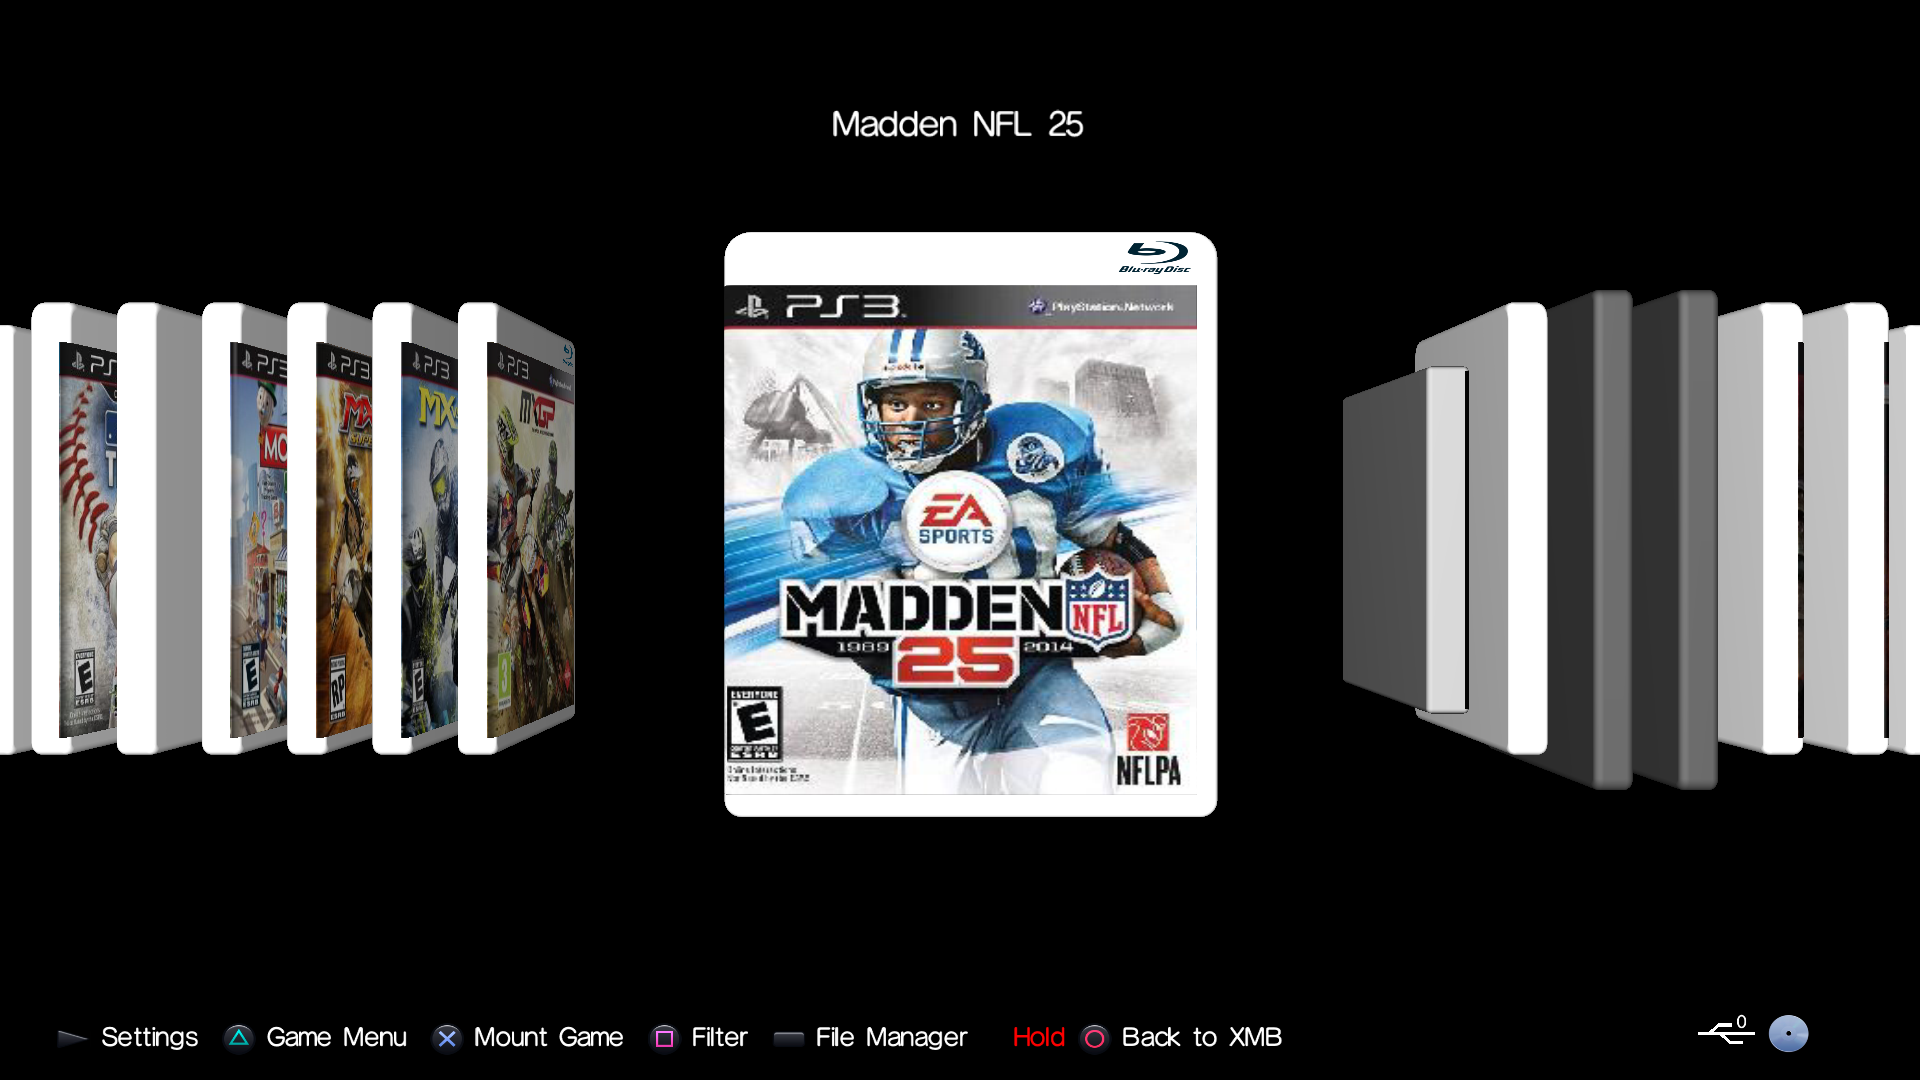 PS3 - ManaGunZ v1 31 - Now Compatible w/ 4 82 CFW + New Features